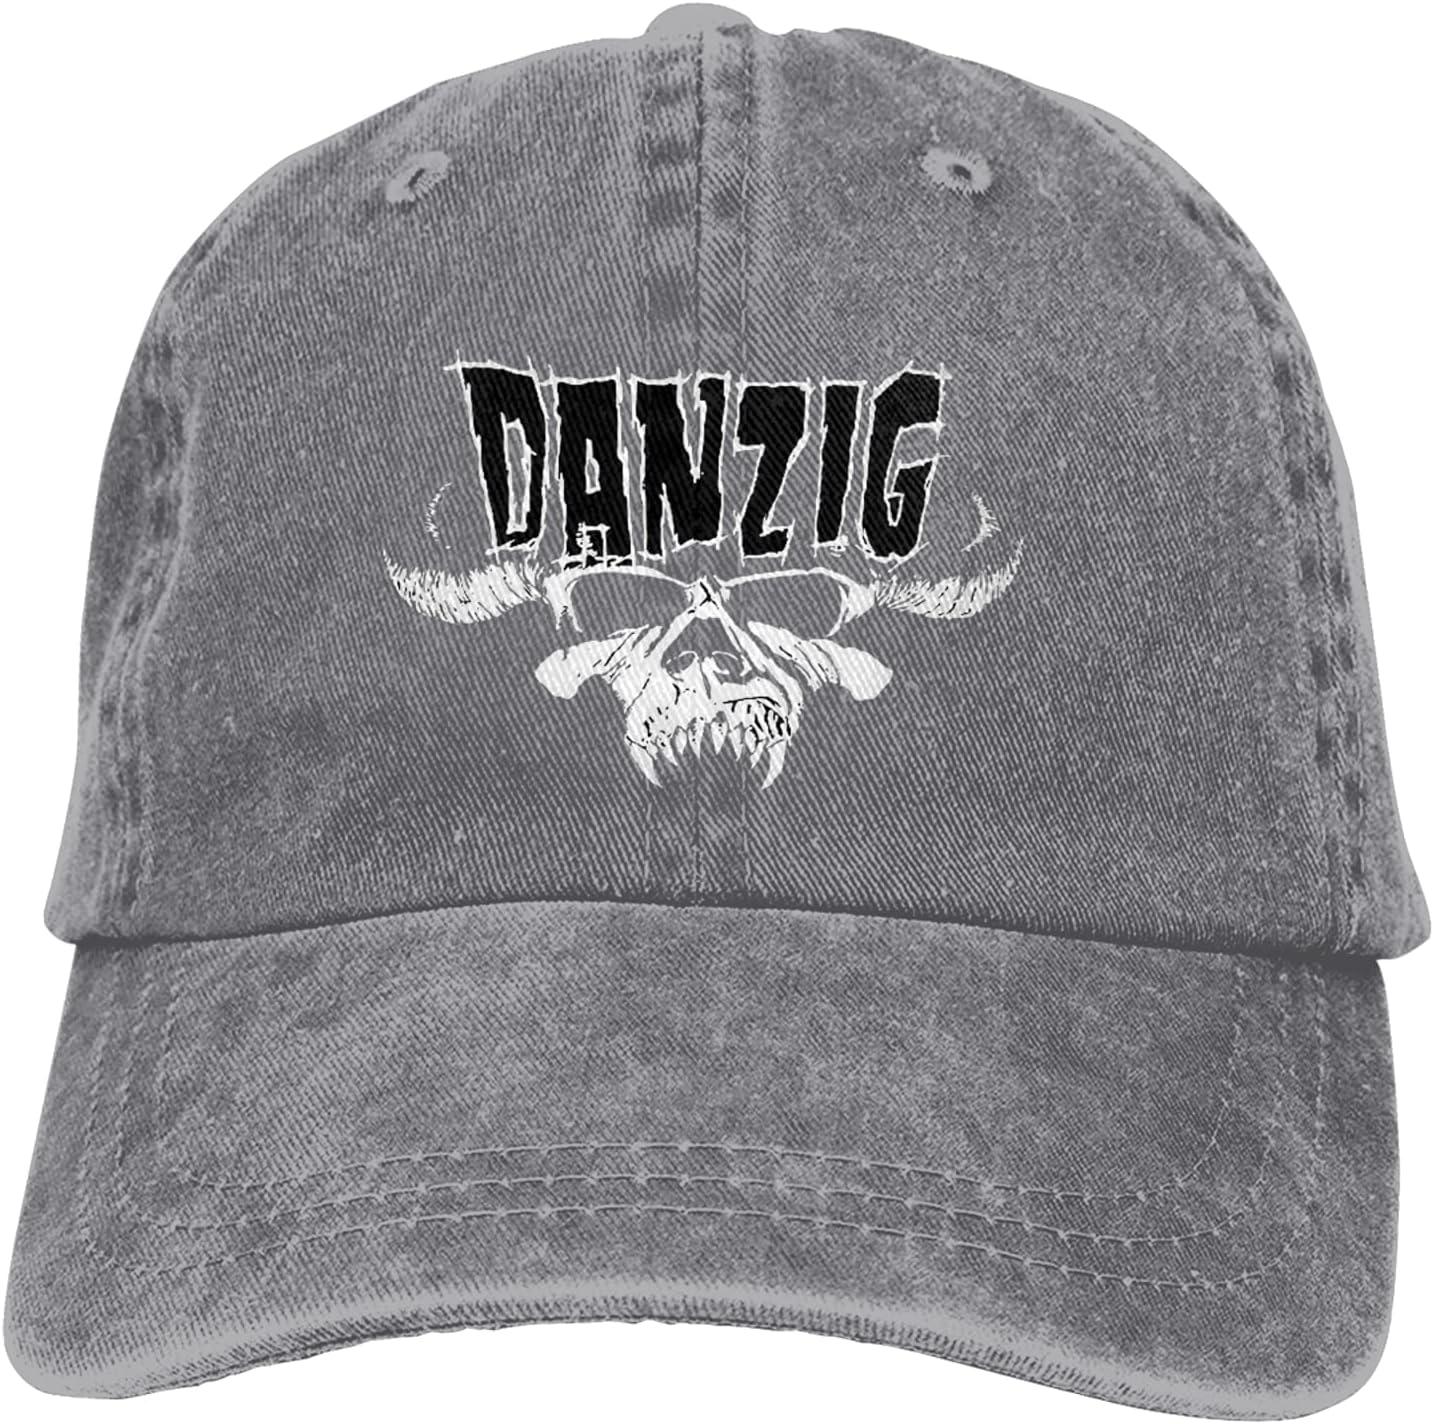 Danzig Cowboy Hat Unisex Adjustable Hat Circumference Size Pure Cotton Denim Wash Water Outdoor